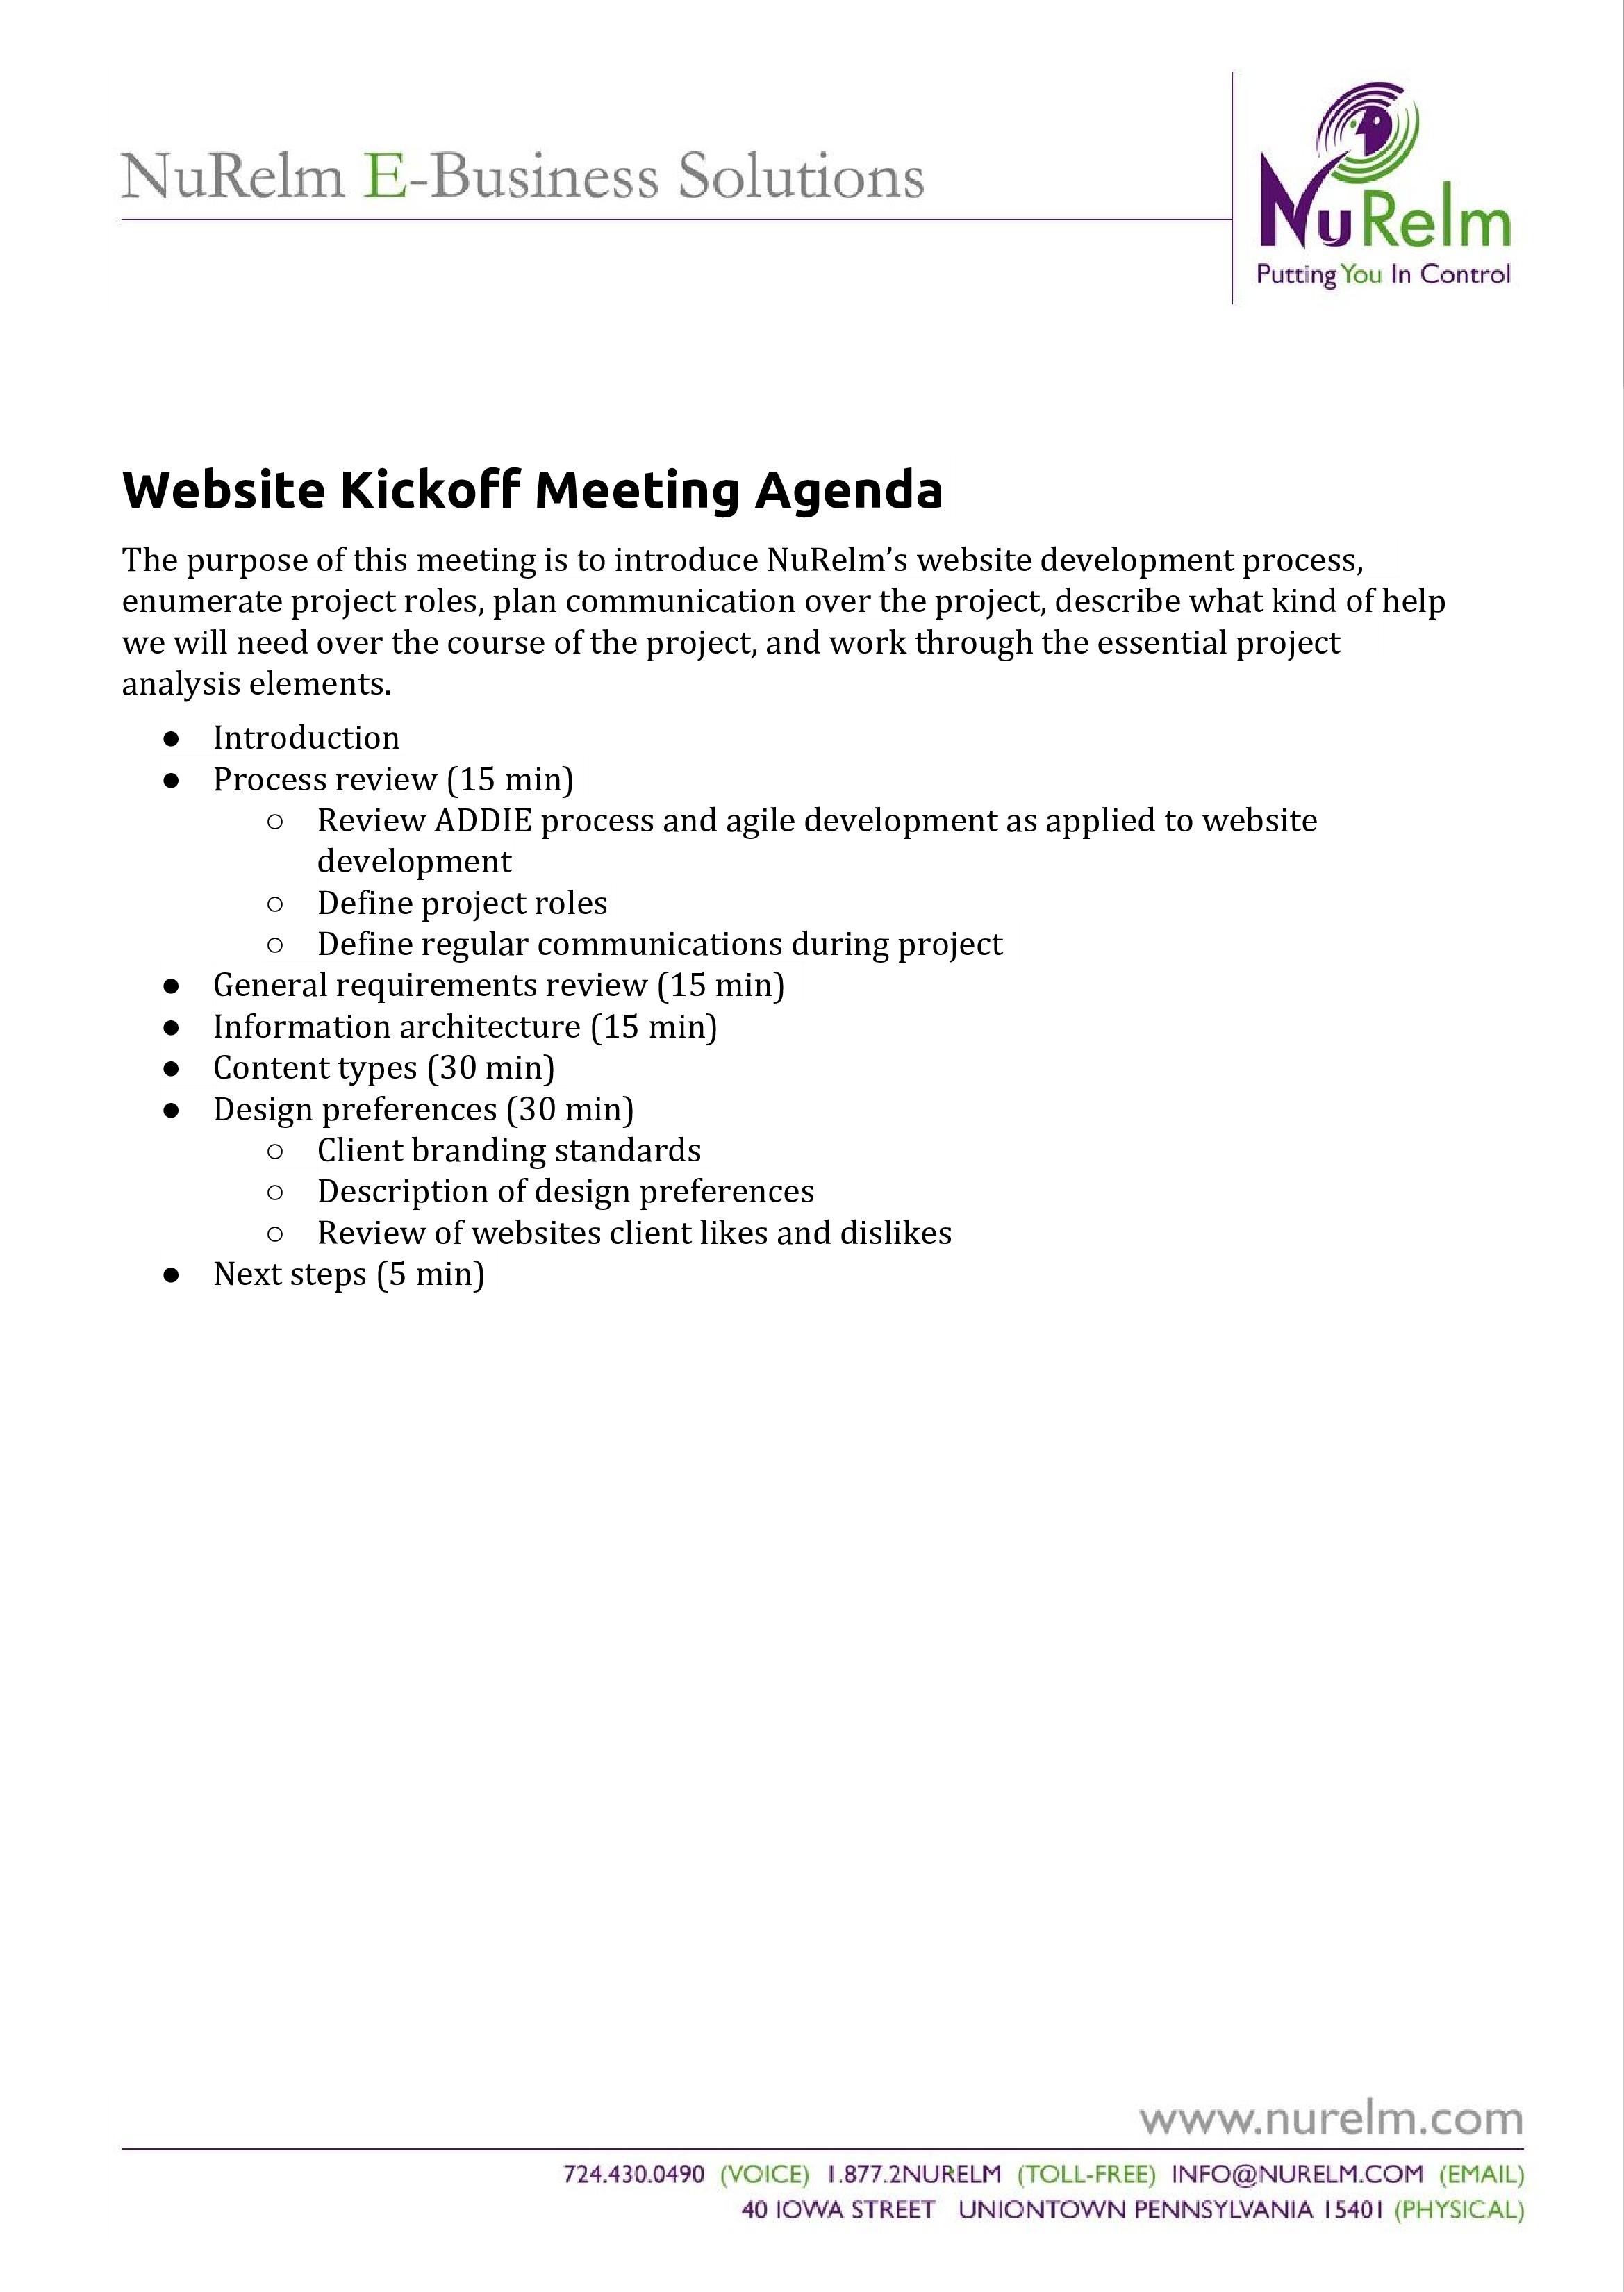 Audit Kick Off Meeting Agenda Template This Story Behind Audit Kick Off Meeting Agenda Templ Meeting Agenda Template Agenda Template Meeting Agenda